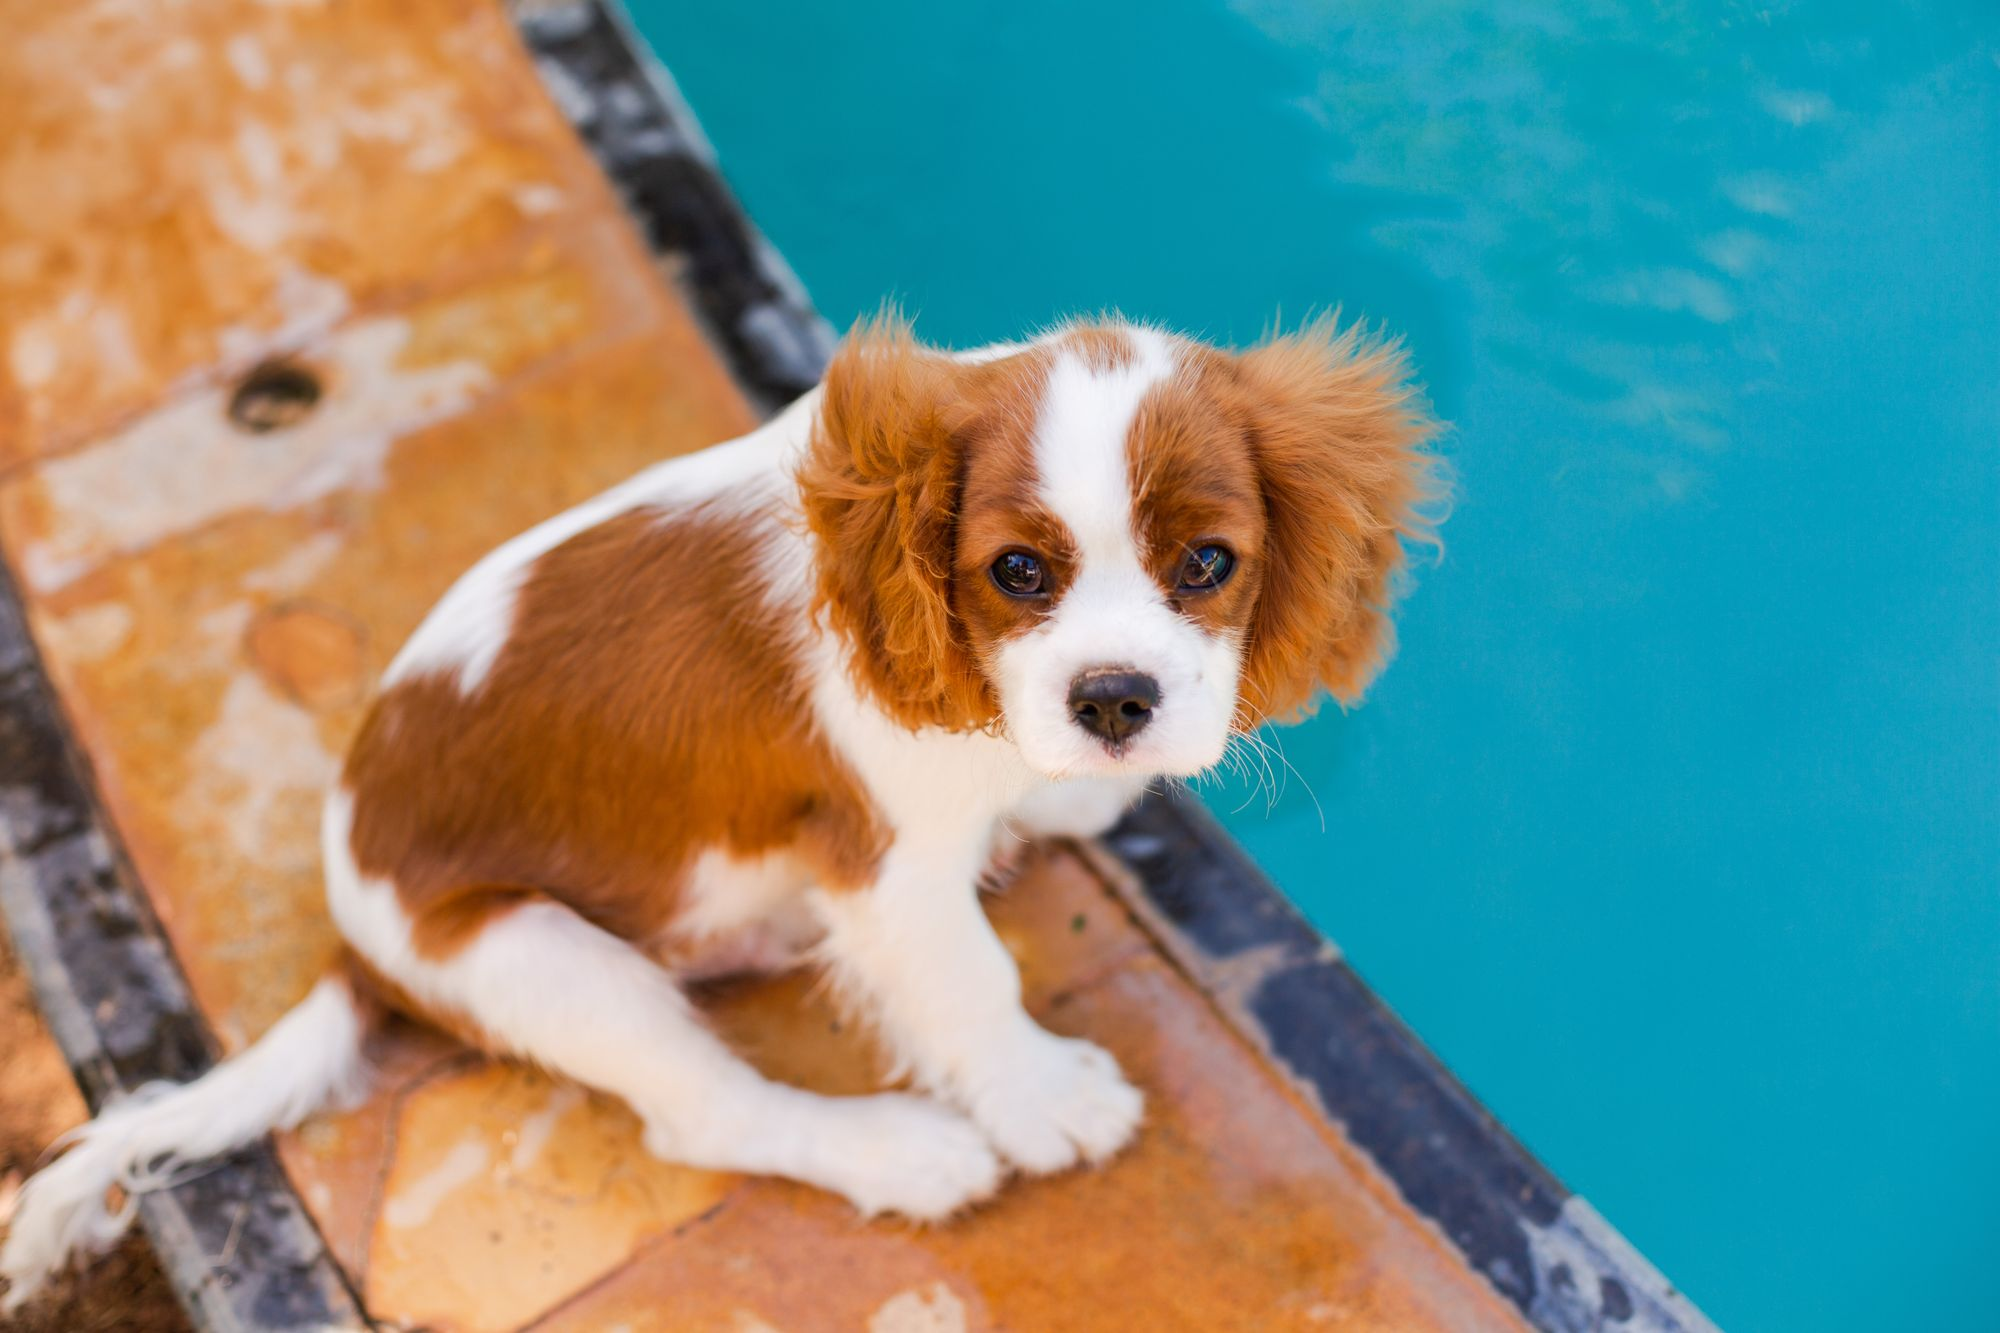 cavalier-king-charles-spaniels-affectionate-dog-unsplash-source